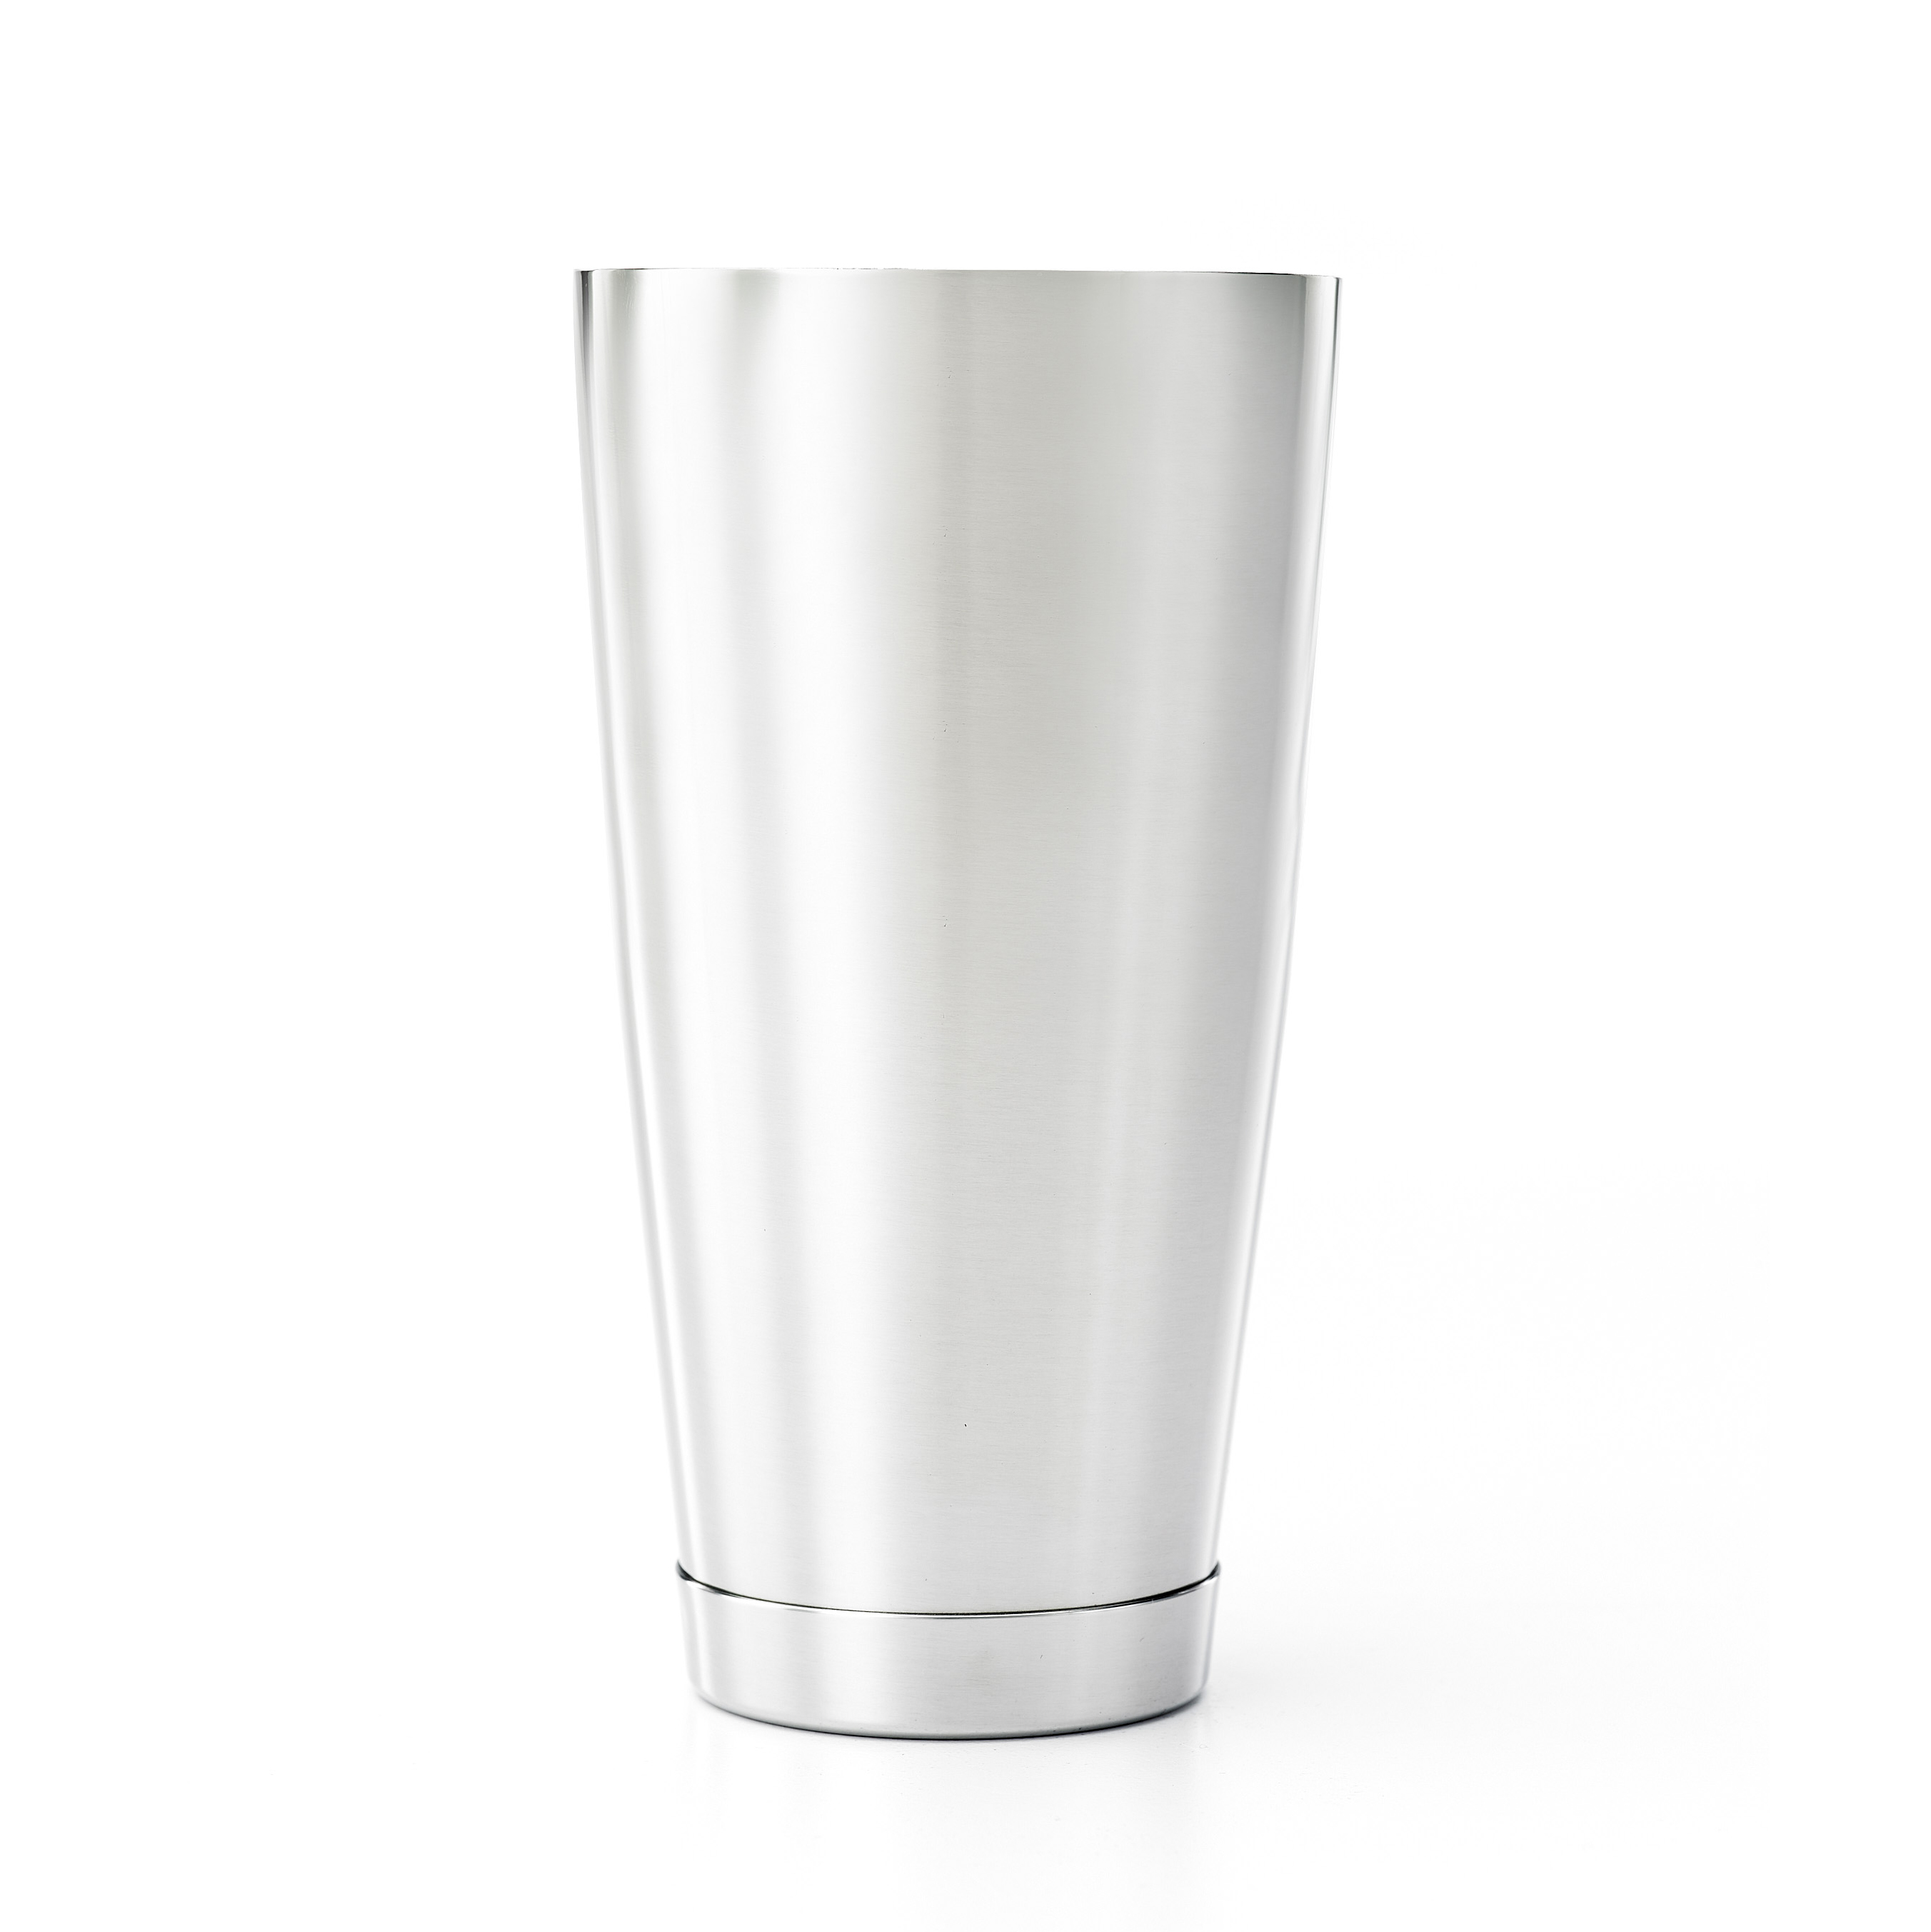 Mercer Culinary M37081 bar cocktail shaker